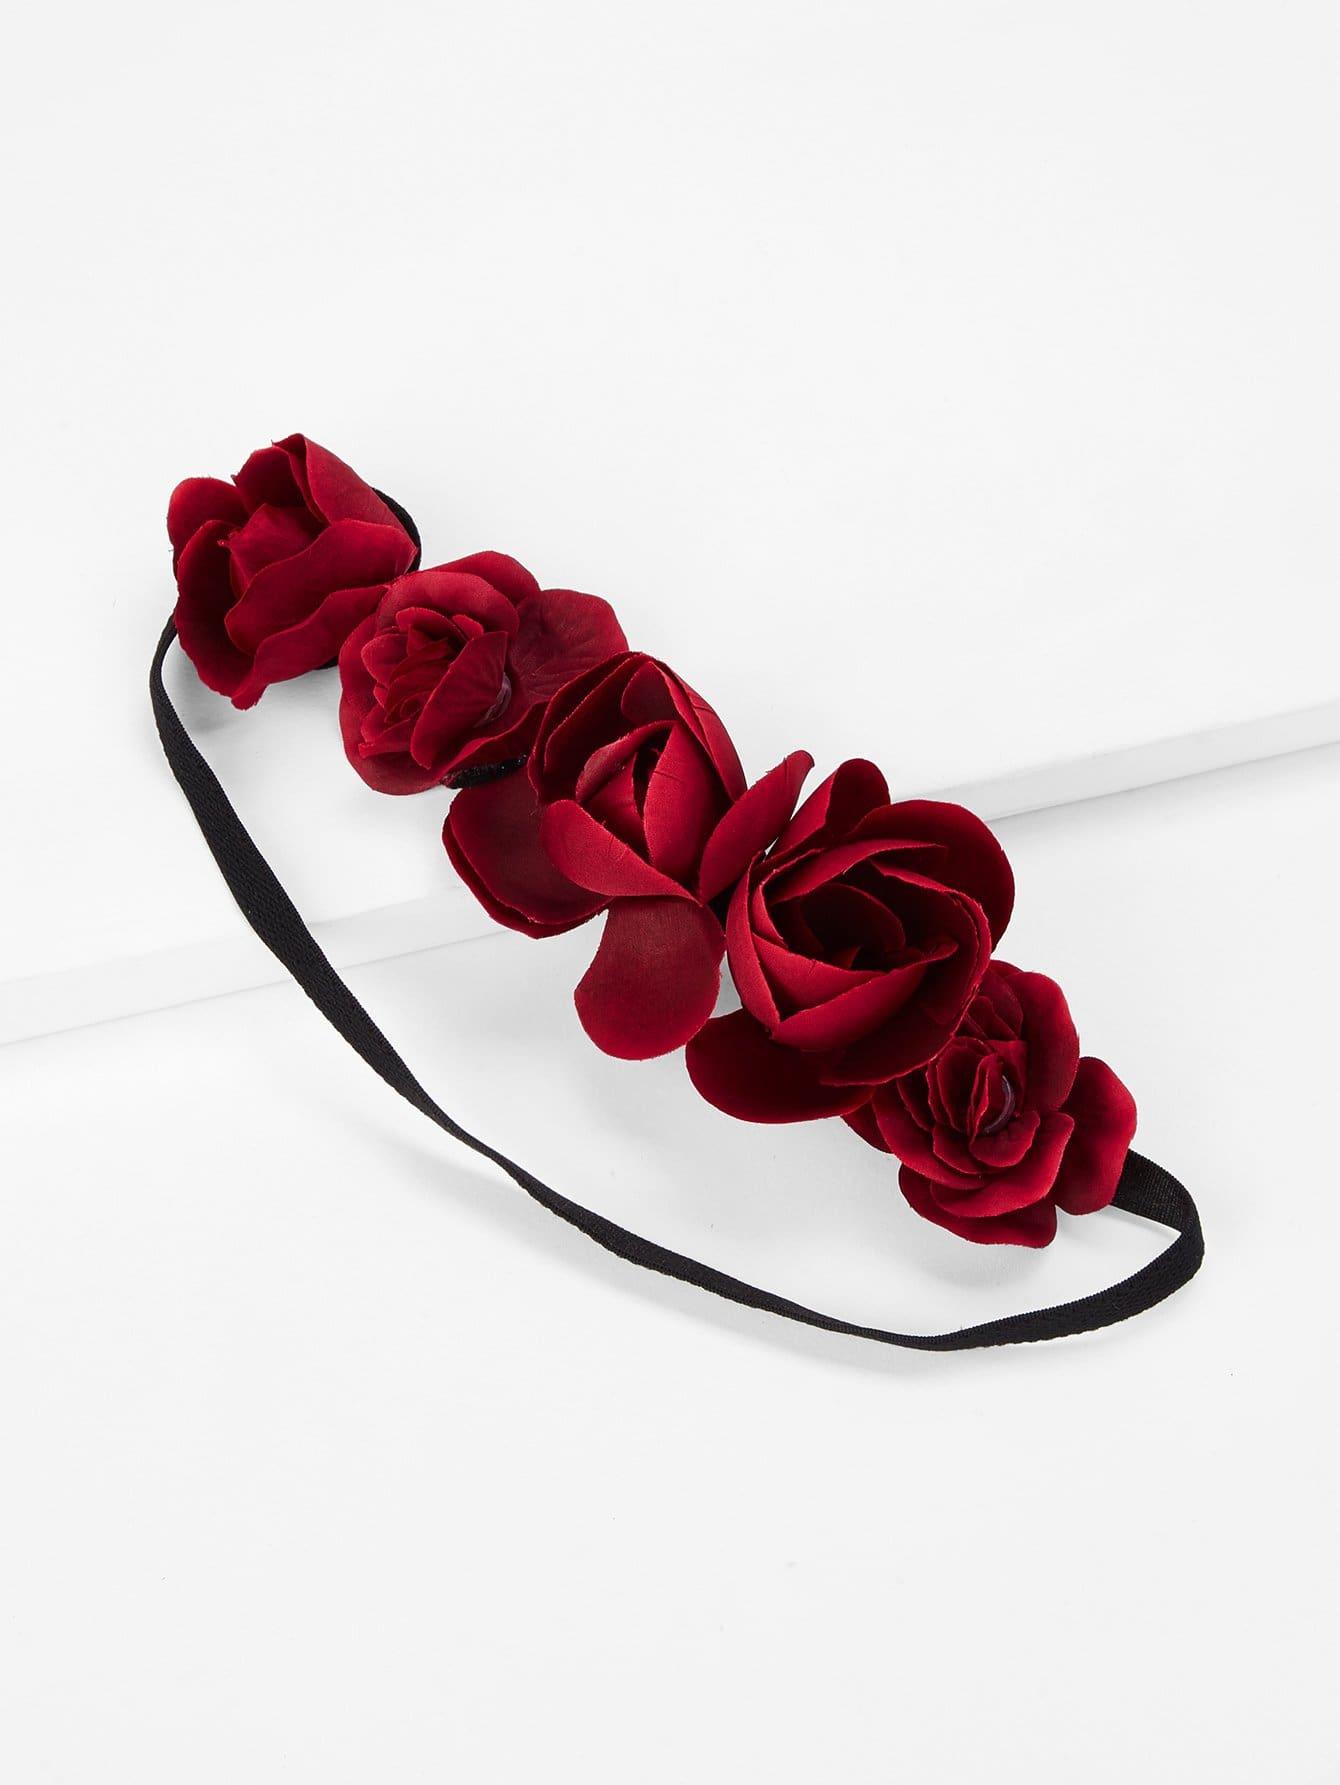 Купить Роза украшена повязка, null, SheIn